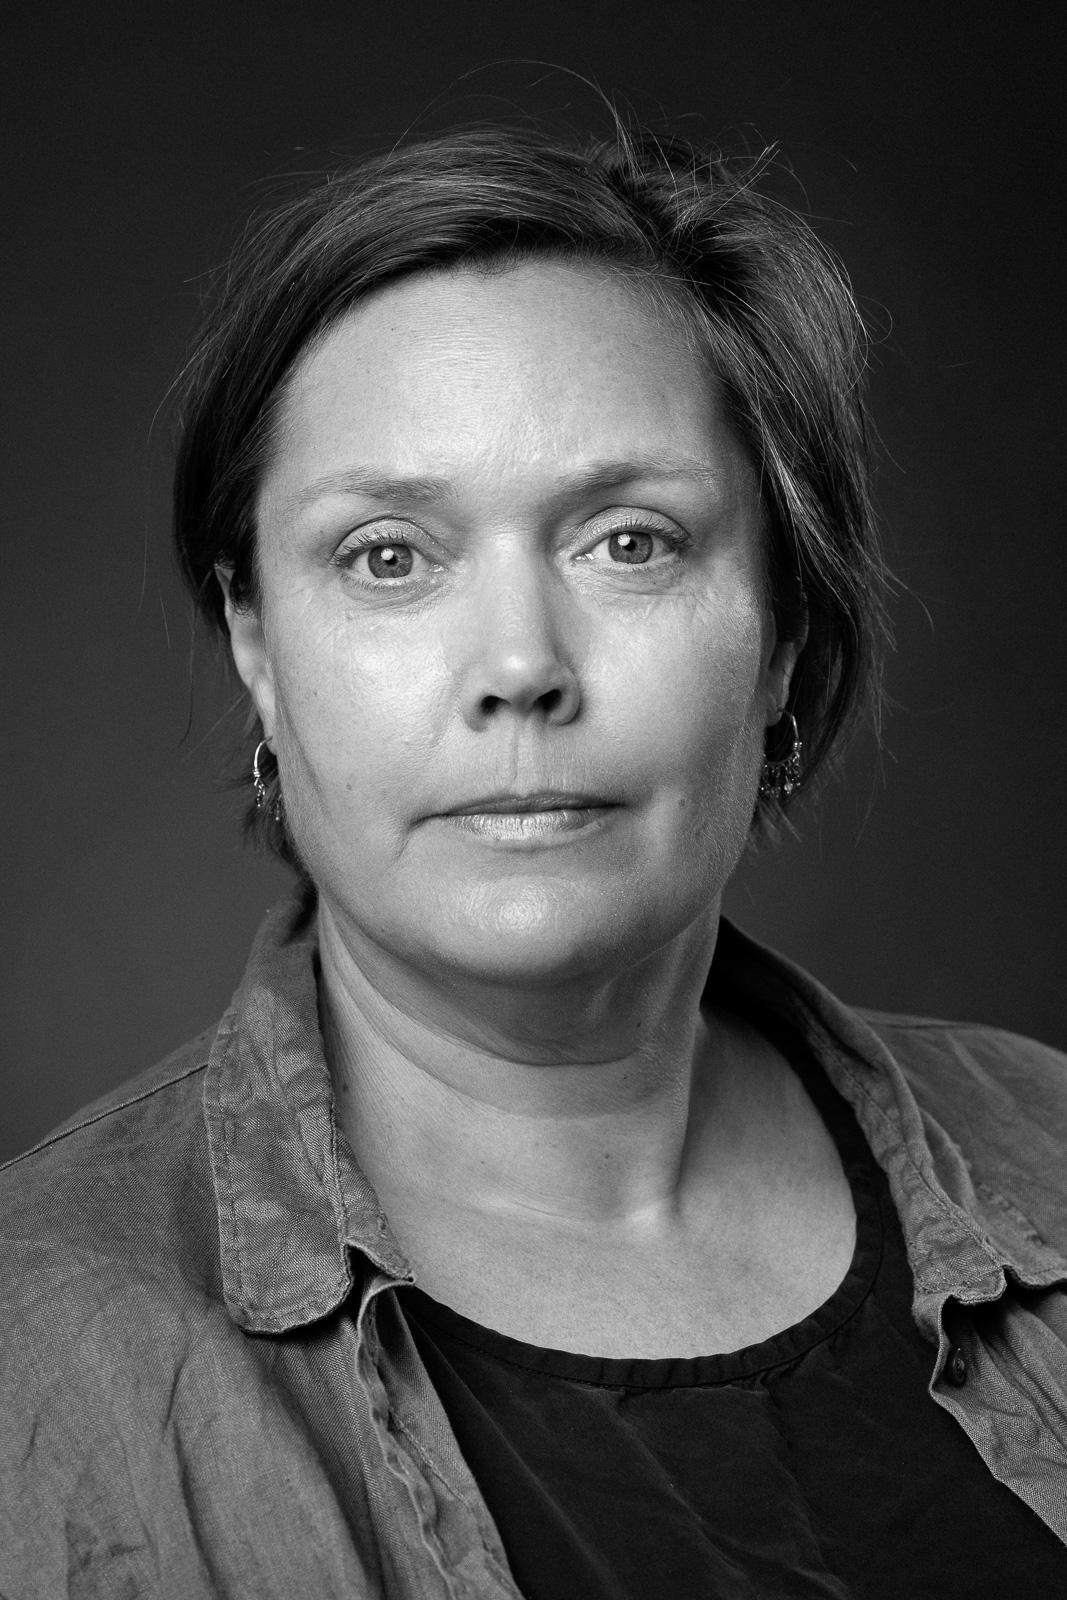 Lenore Messick